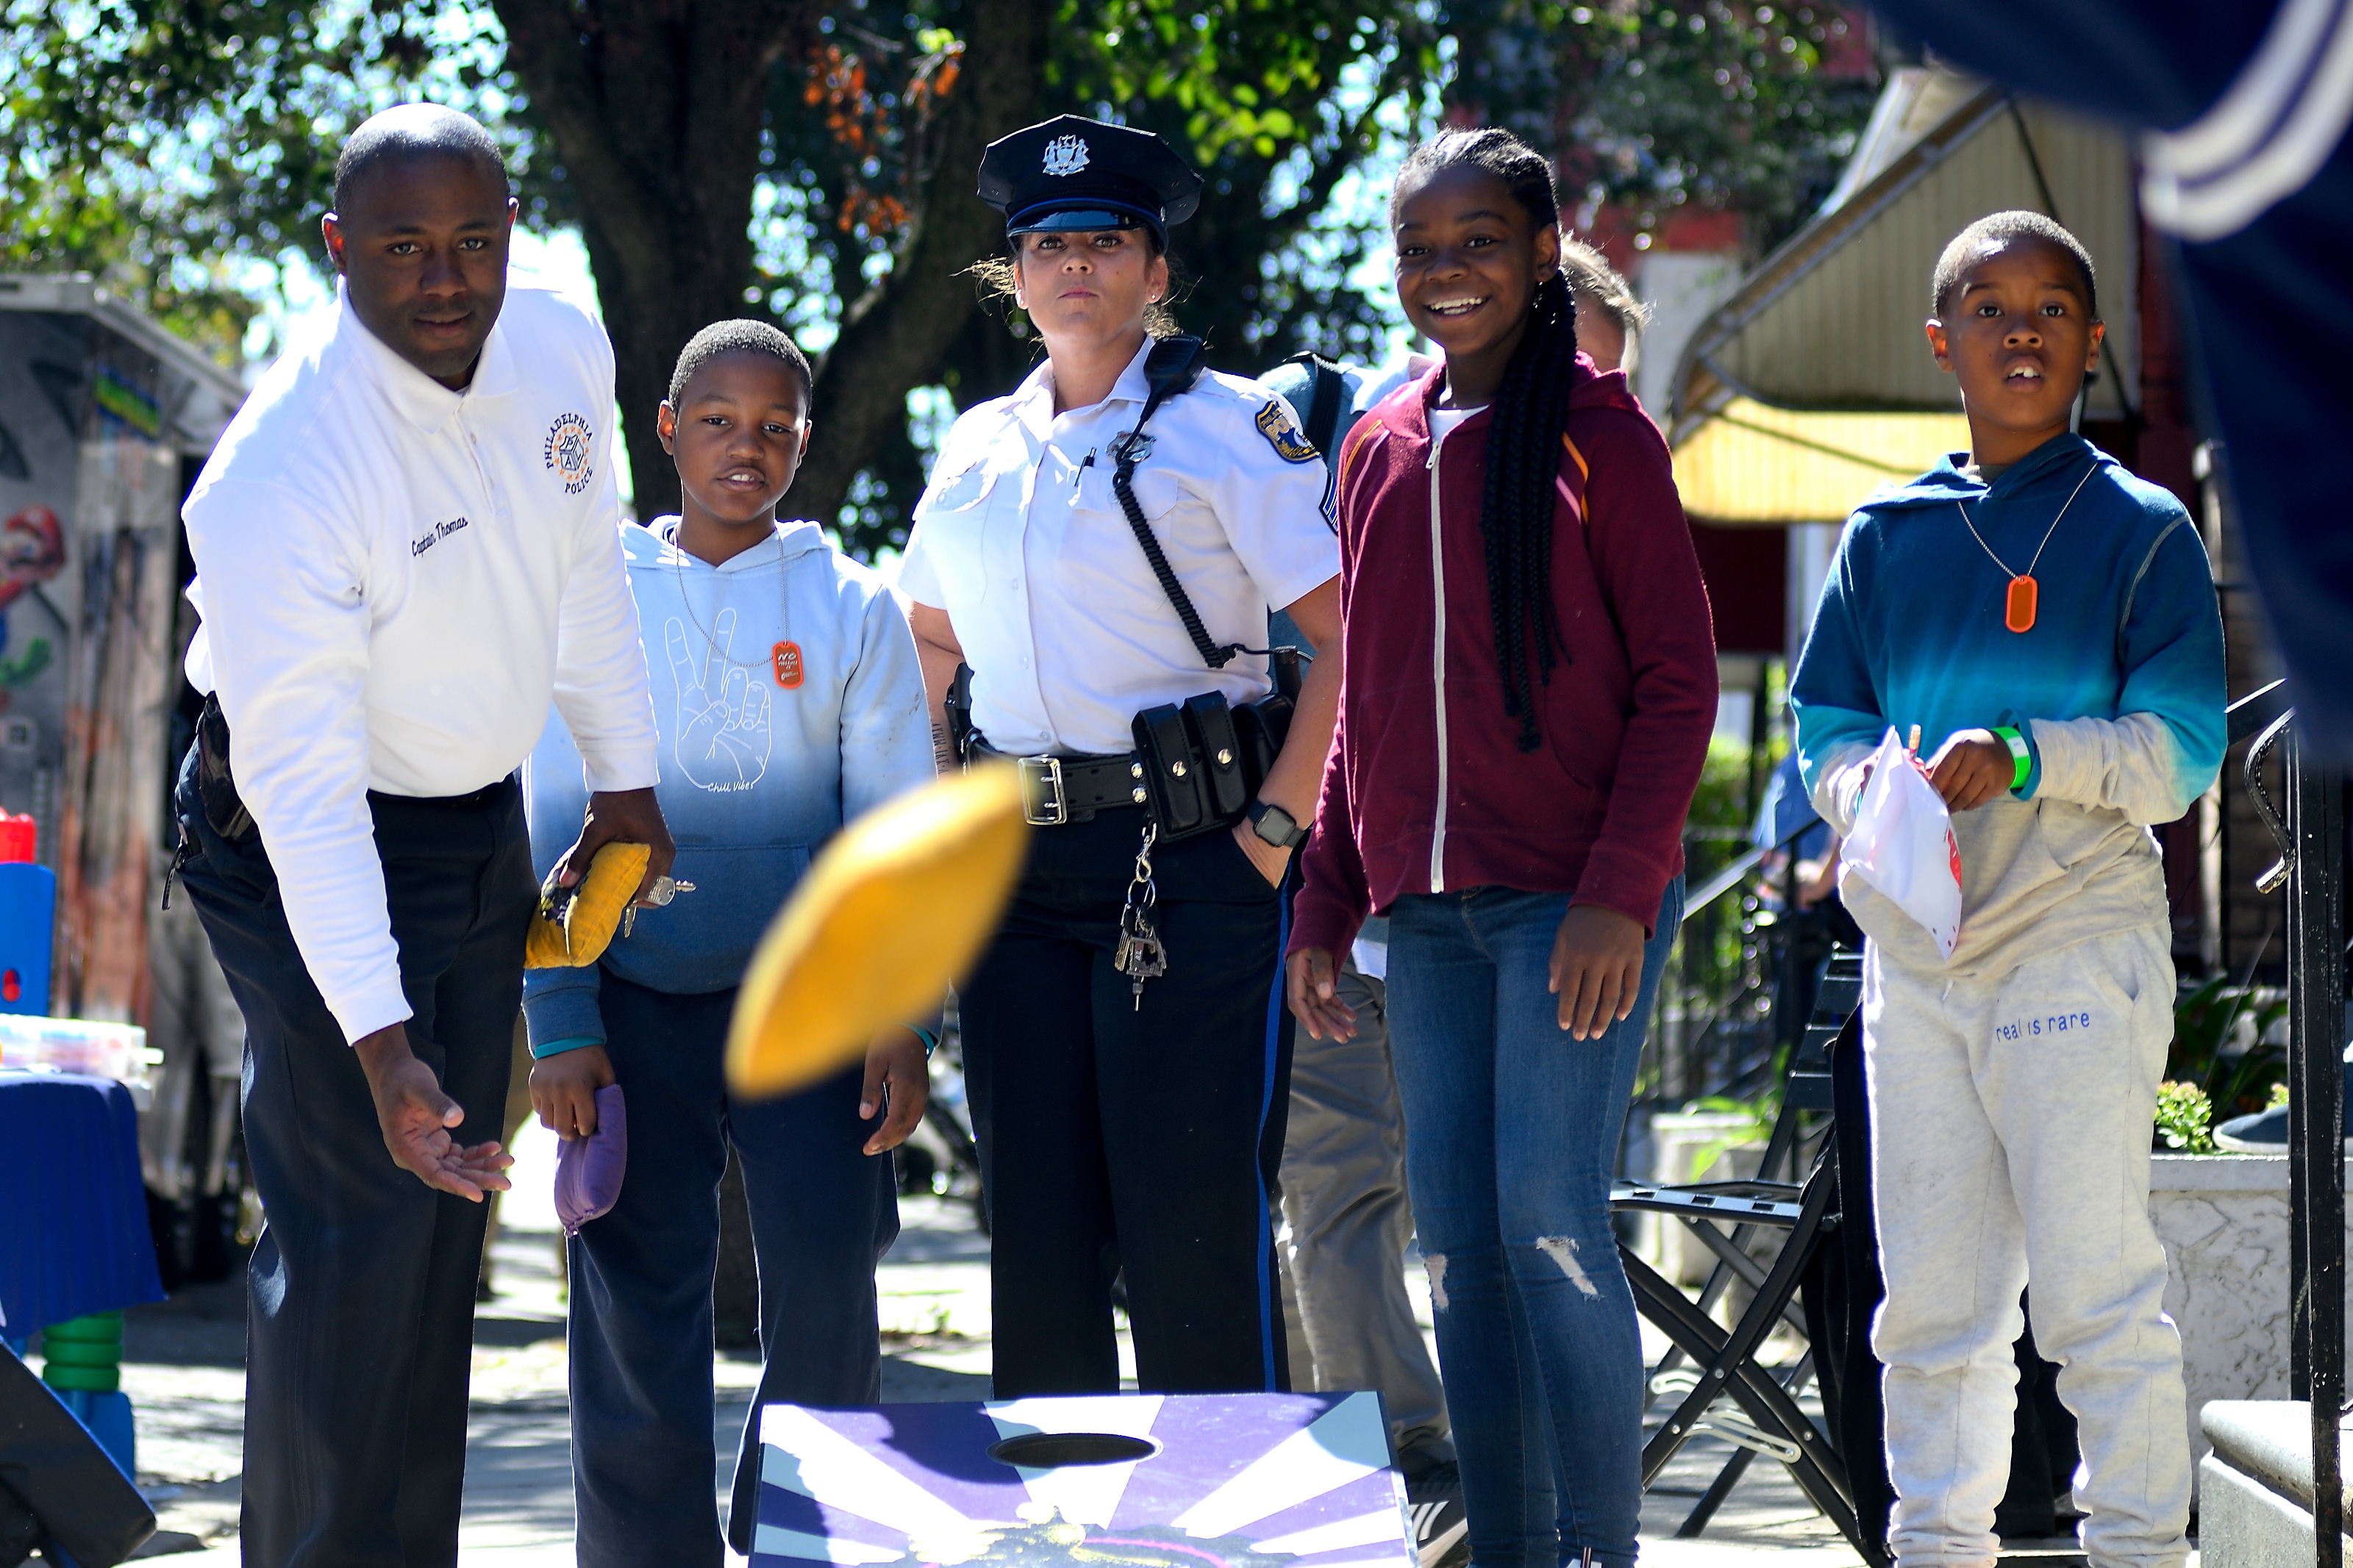 Nicetown-Tioga Neighbors Heal After Police Shootout